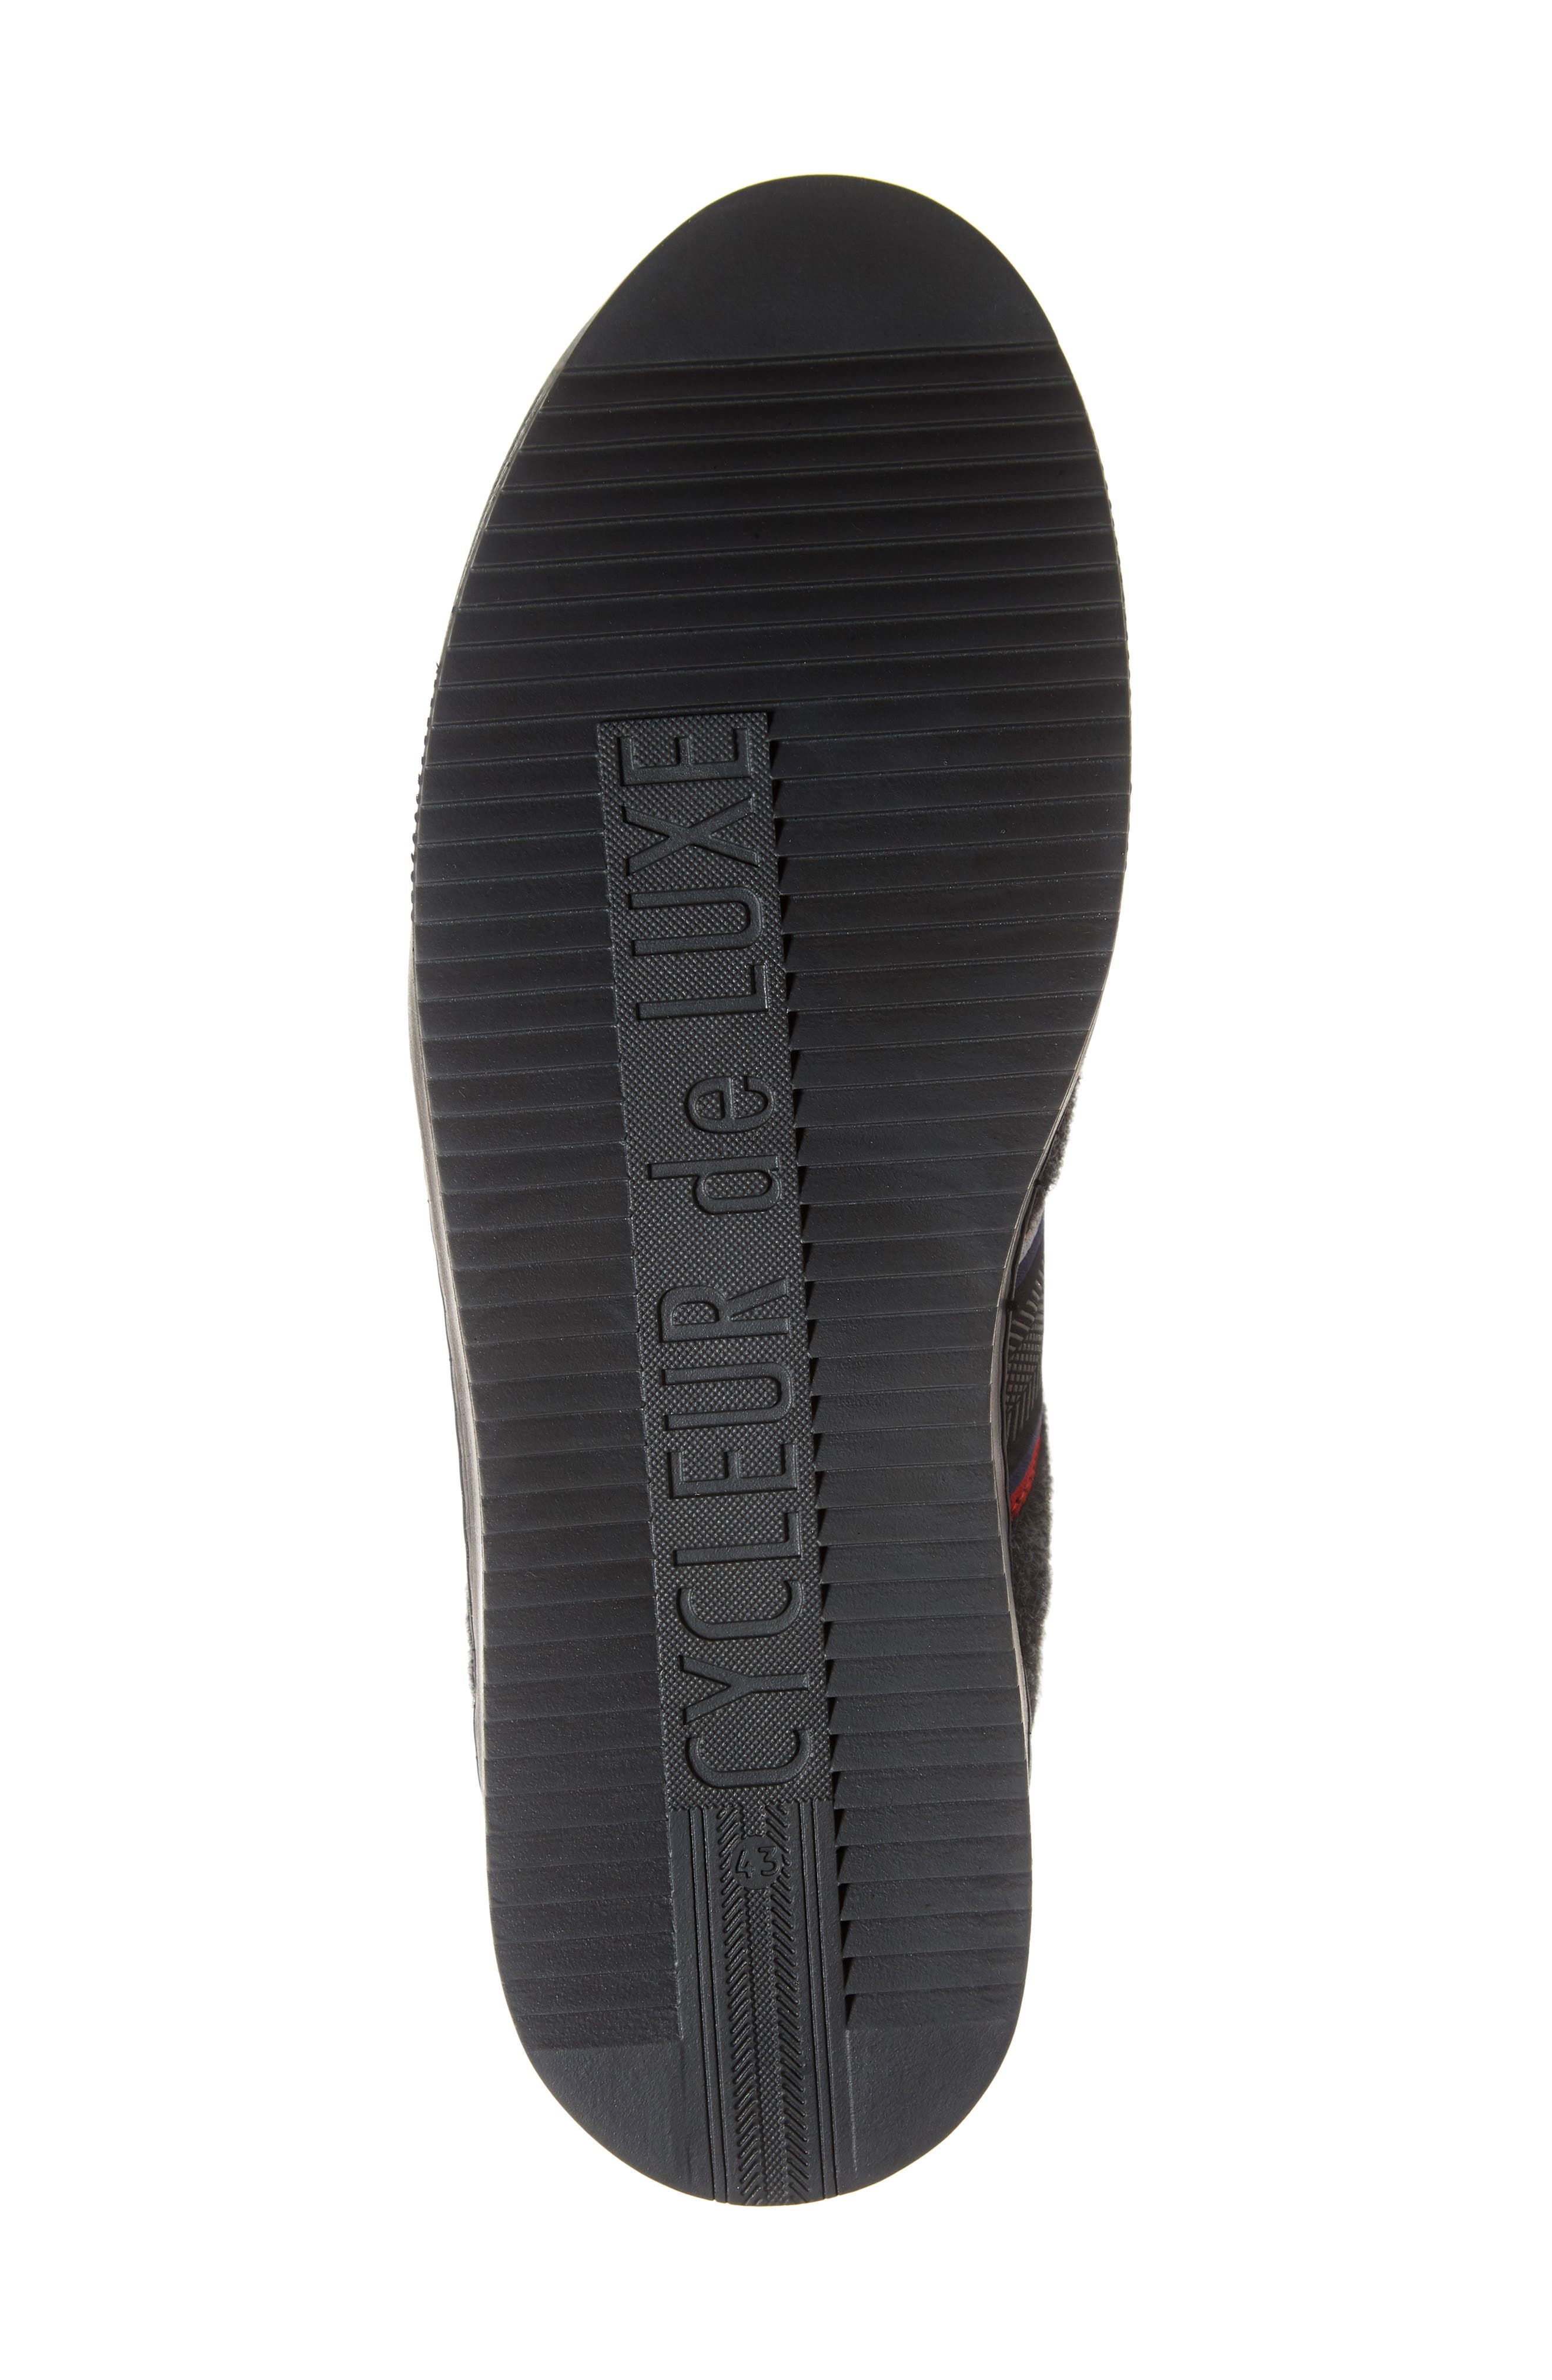 Poggio Sneaker,                             Alternate thumbnail 6, color,                             BLACK